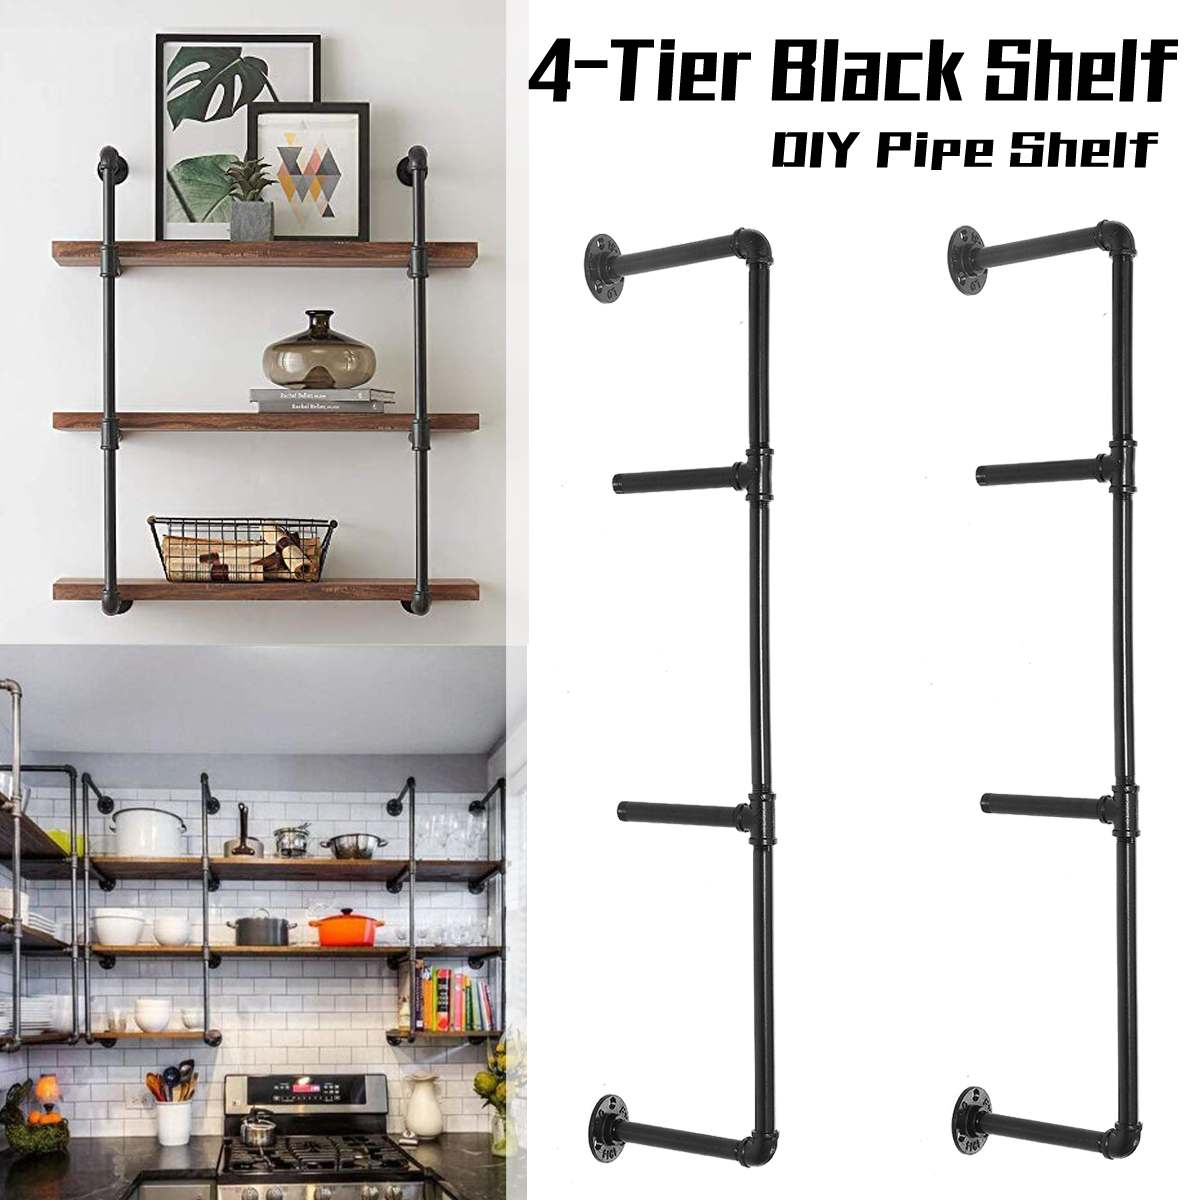 2 PCS 4 Tier Shelf Industrial Furniture Wall Shelf Bracket Hanging Storage Shelves Iron Pipe Black DIY Pipe Shelves